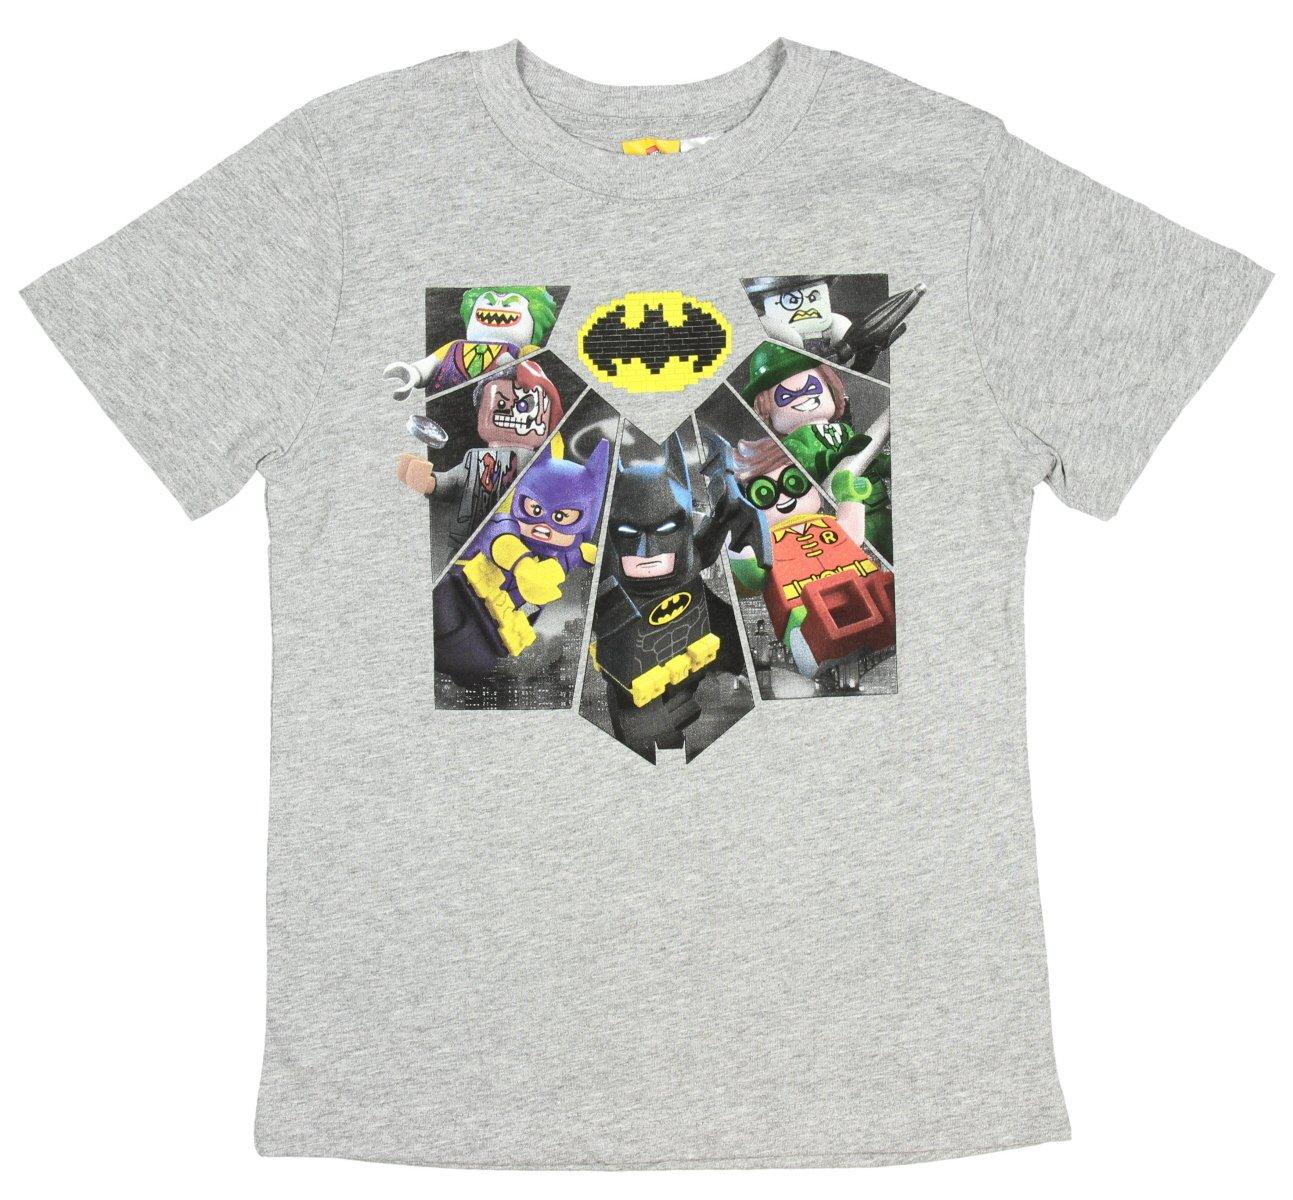 Lego Batman Movie Character Shirt For S 4 16 Batman Robin Batgirl Joker P